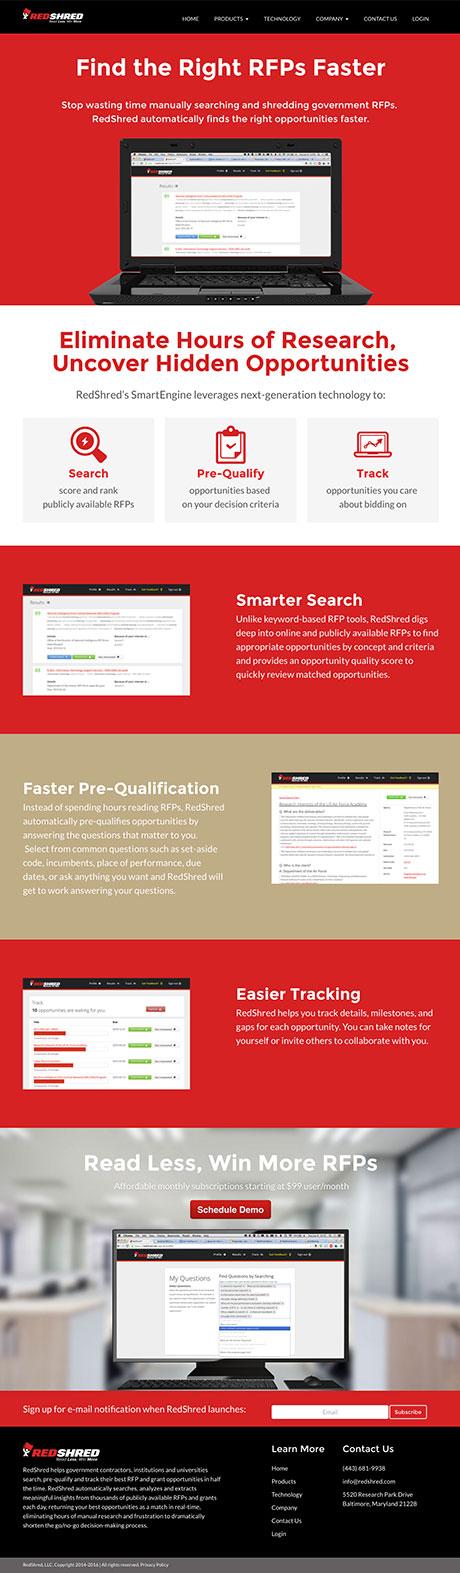 redshred-website-design-product-page.jpg